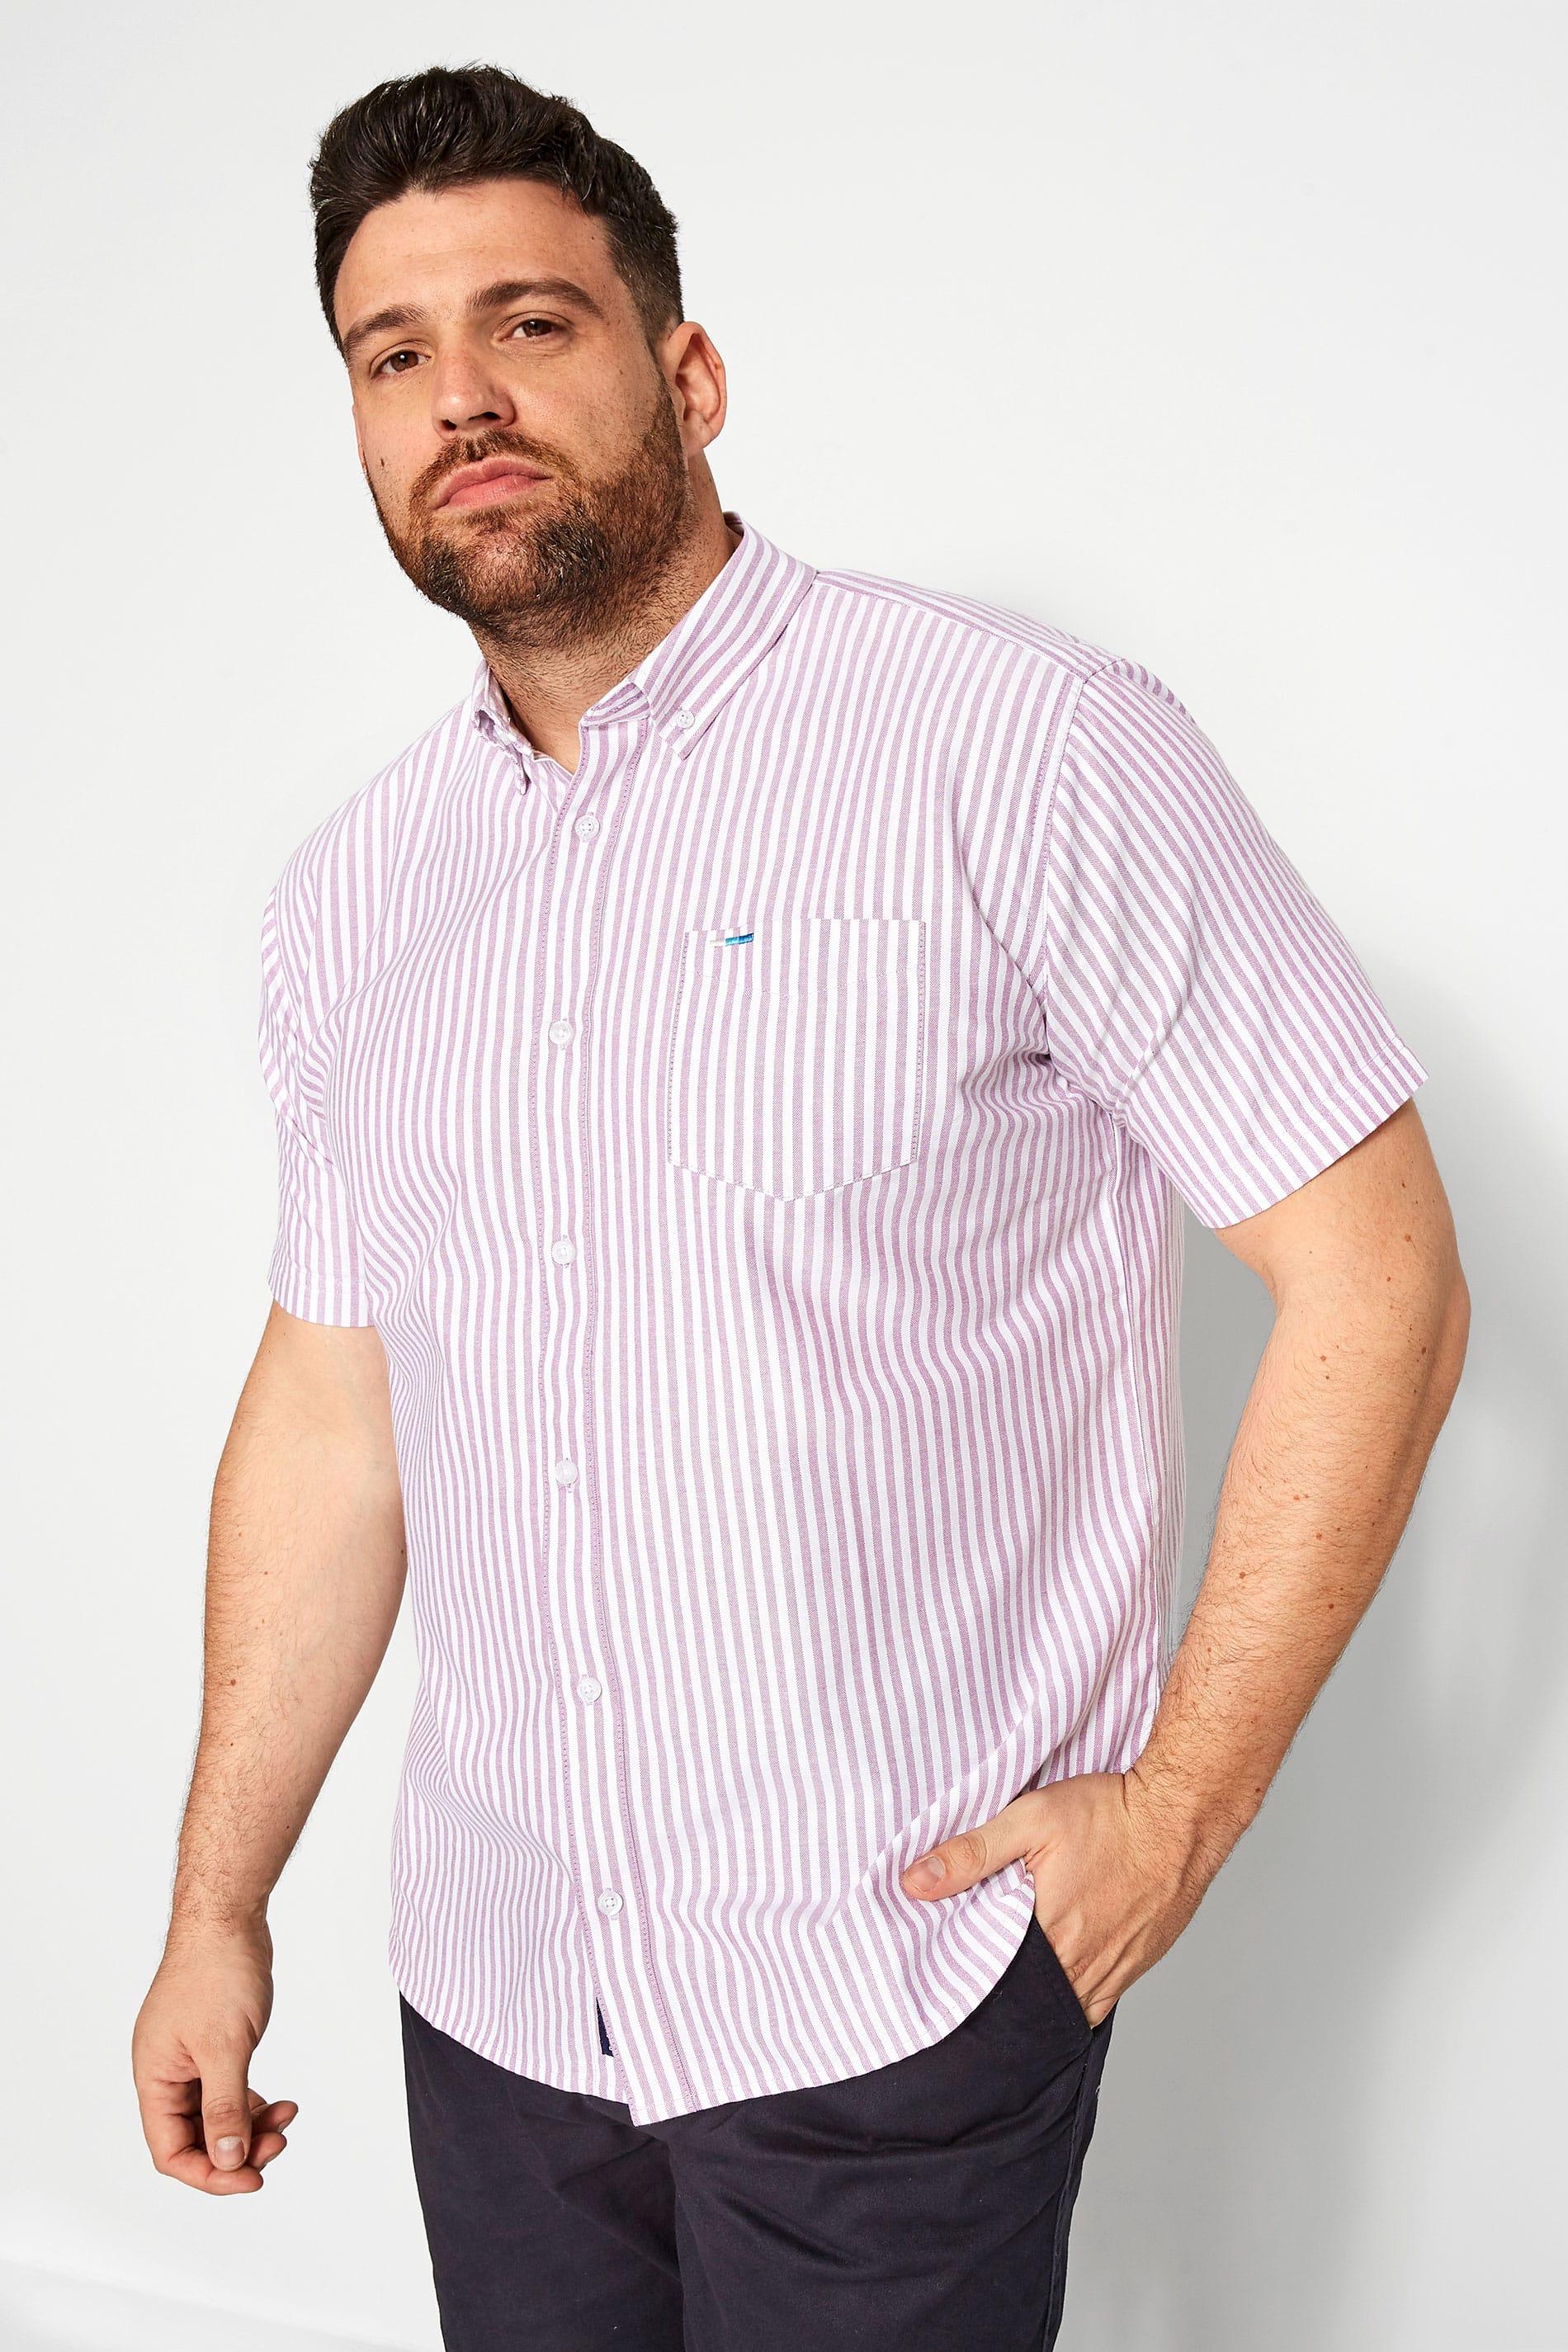 BadRhino Lilac Striped Short Sleeved Oxford Shirt